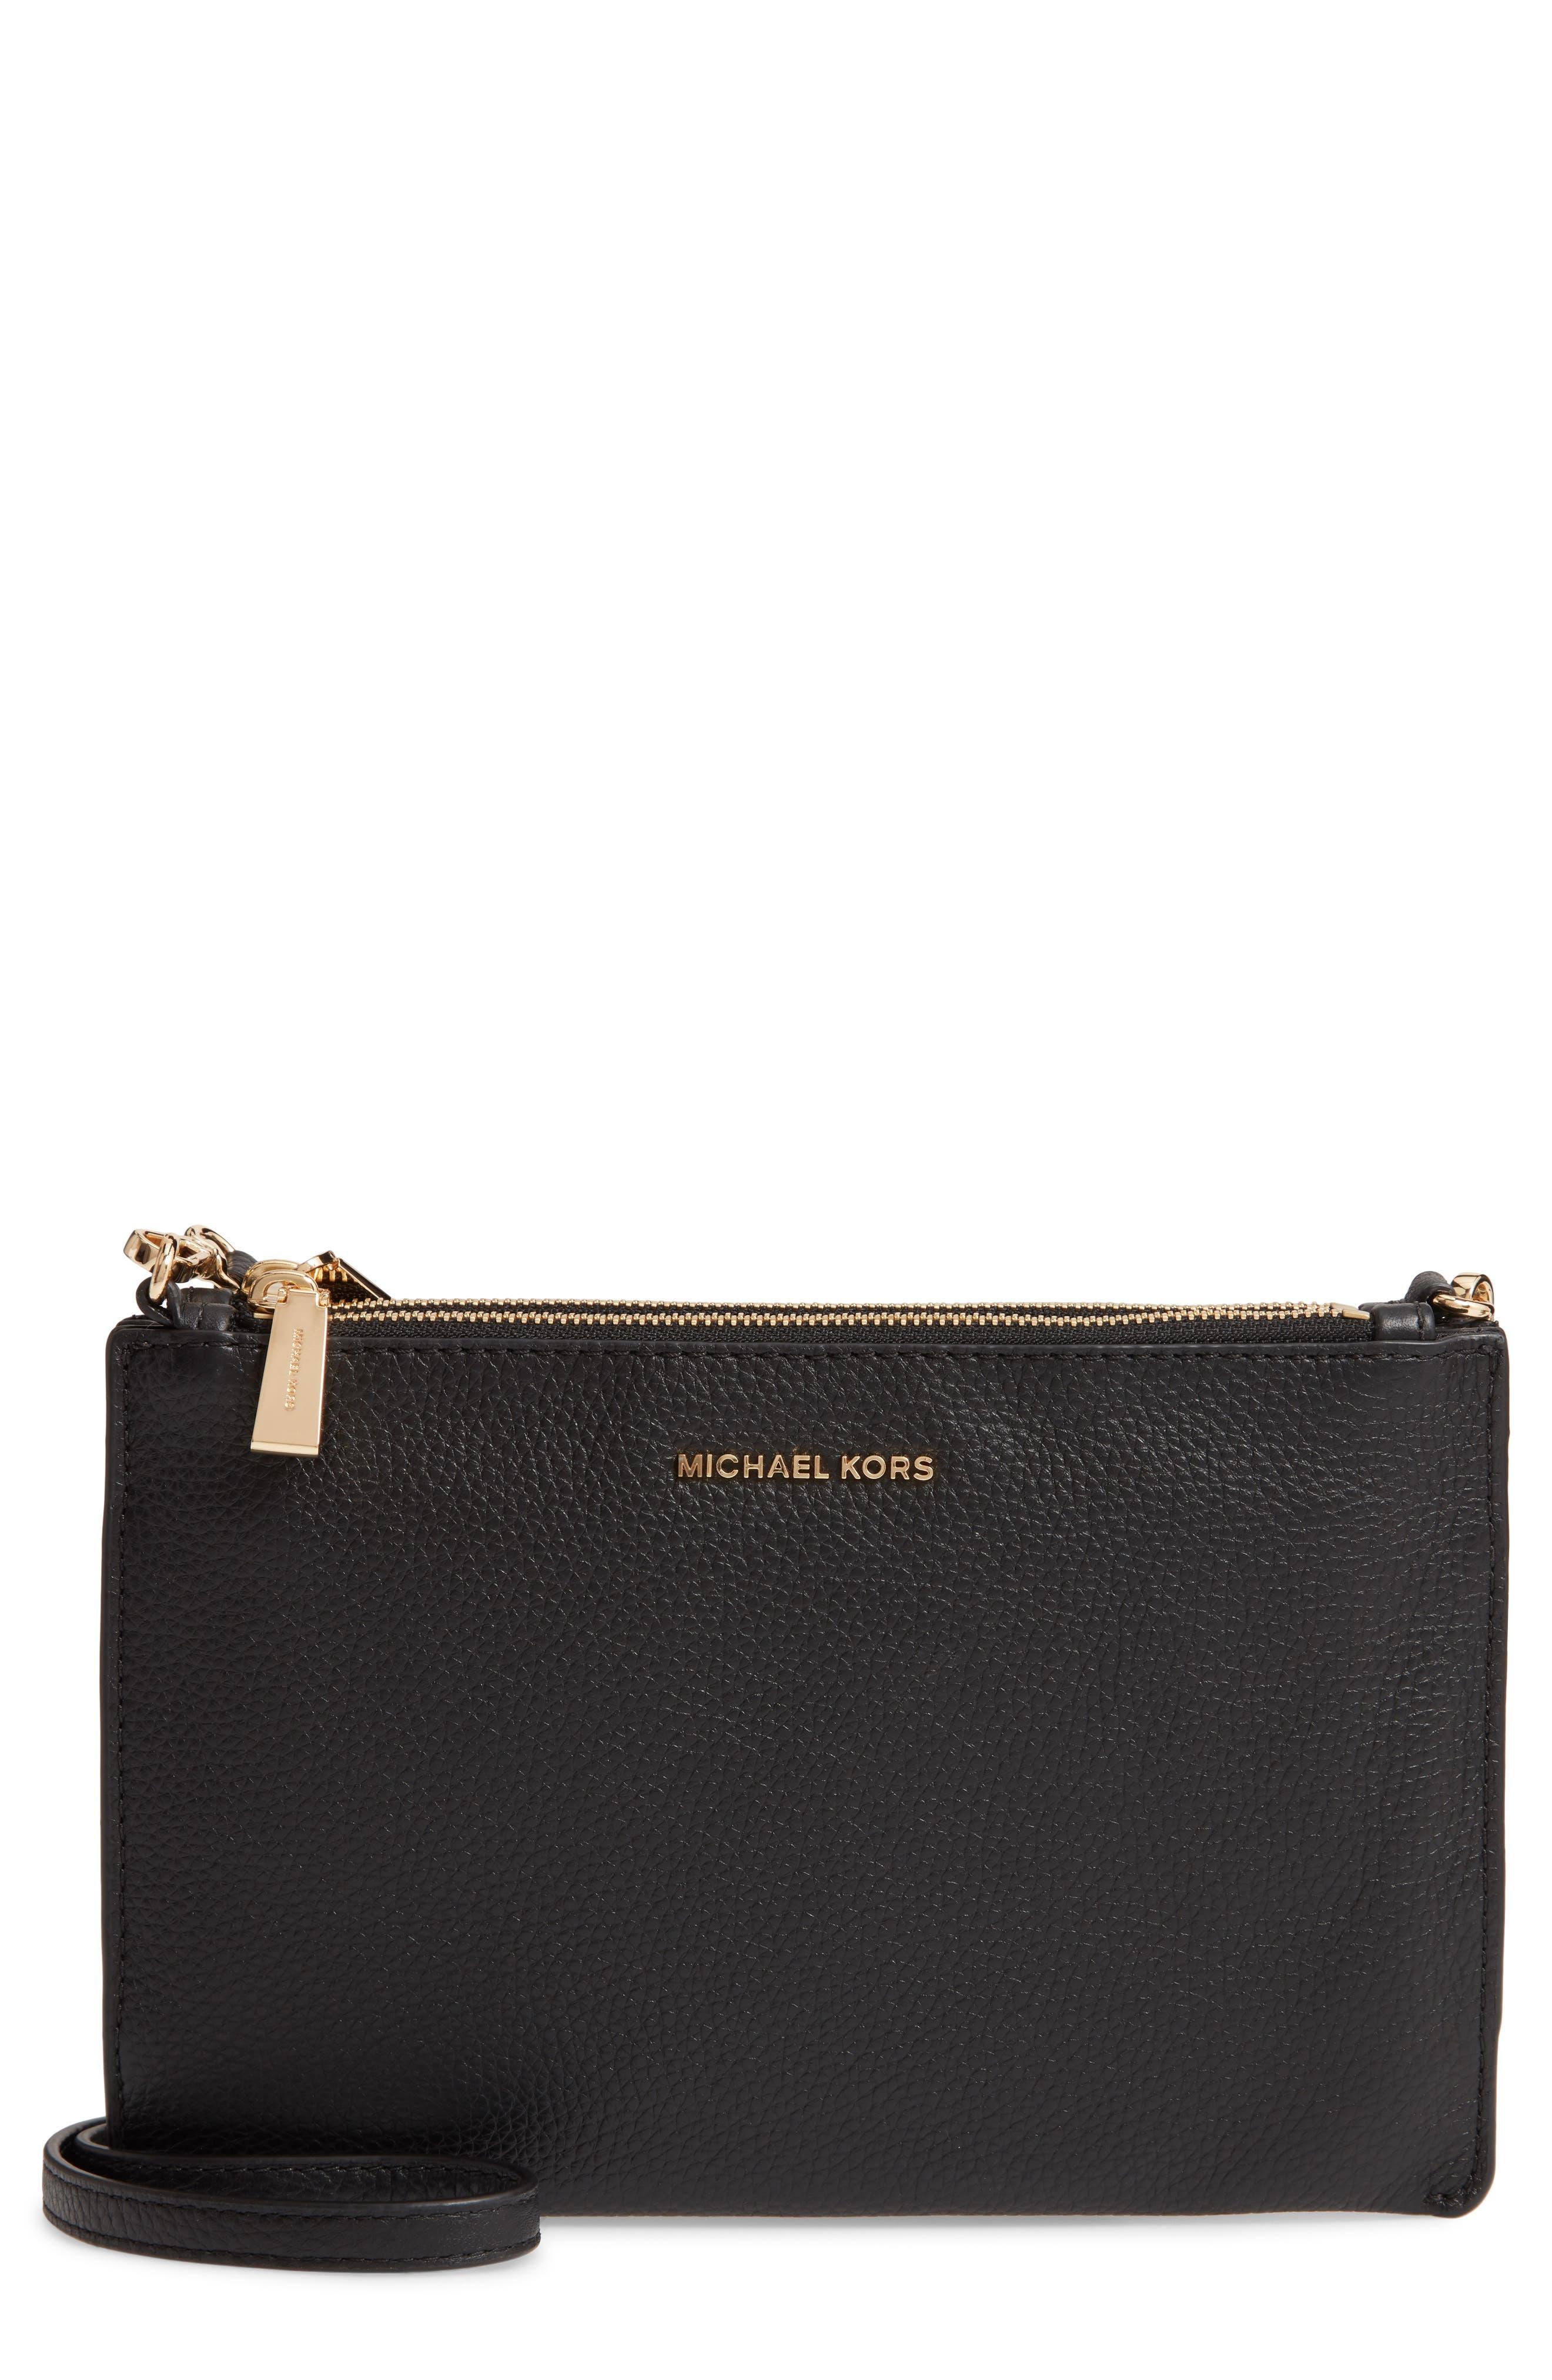 d76de5ac1983 Women's MICHAEL Michael Kors Handbags | Nordstrom